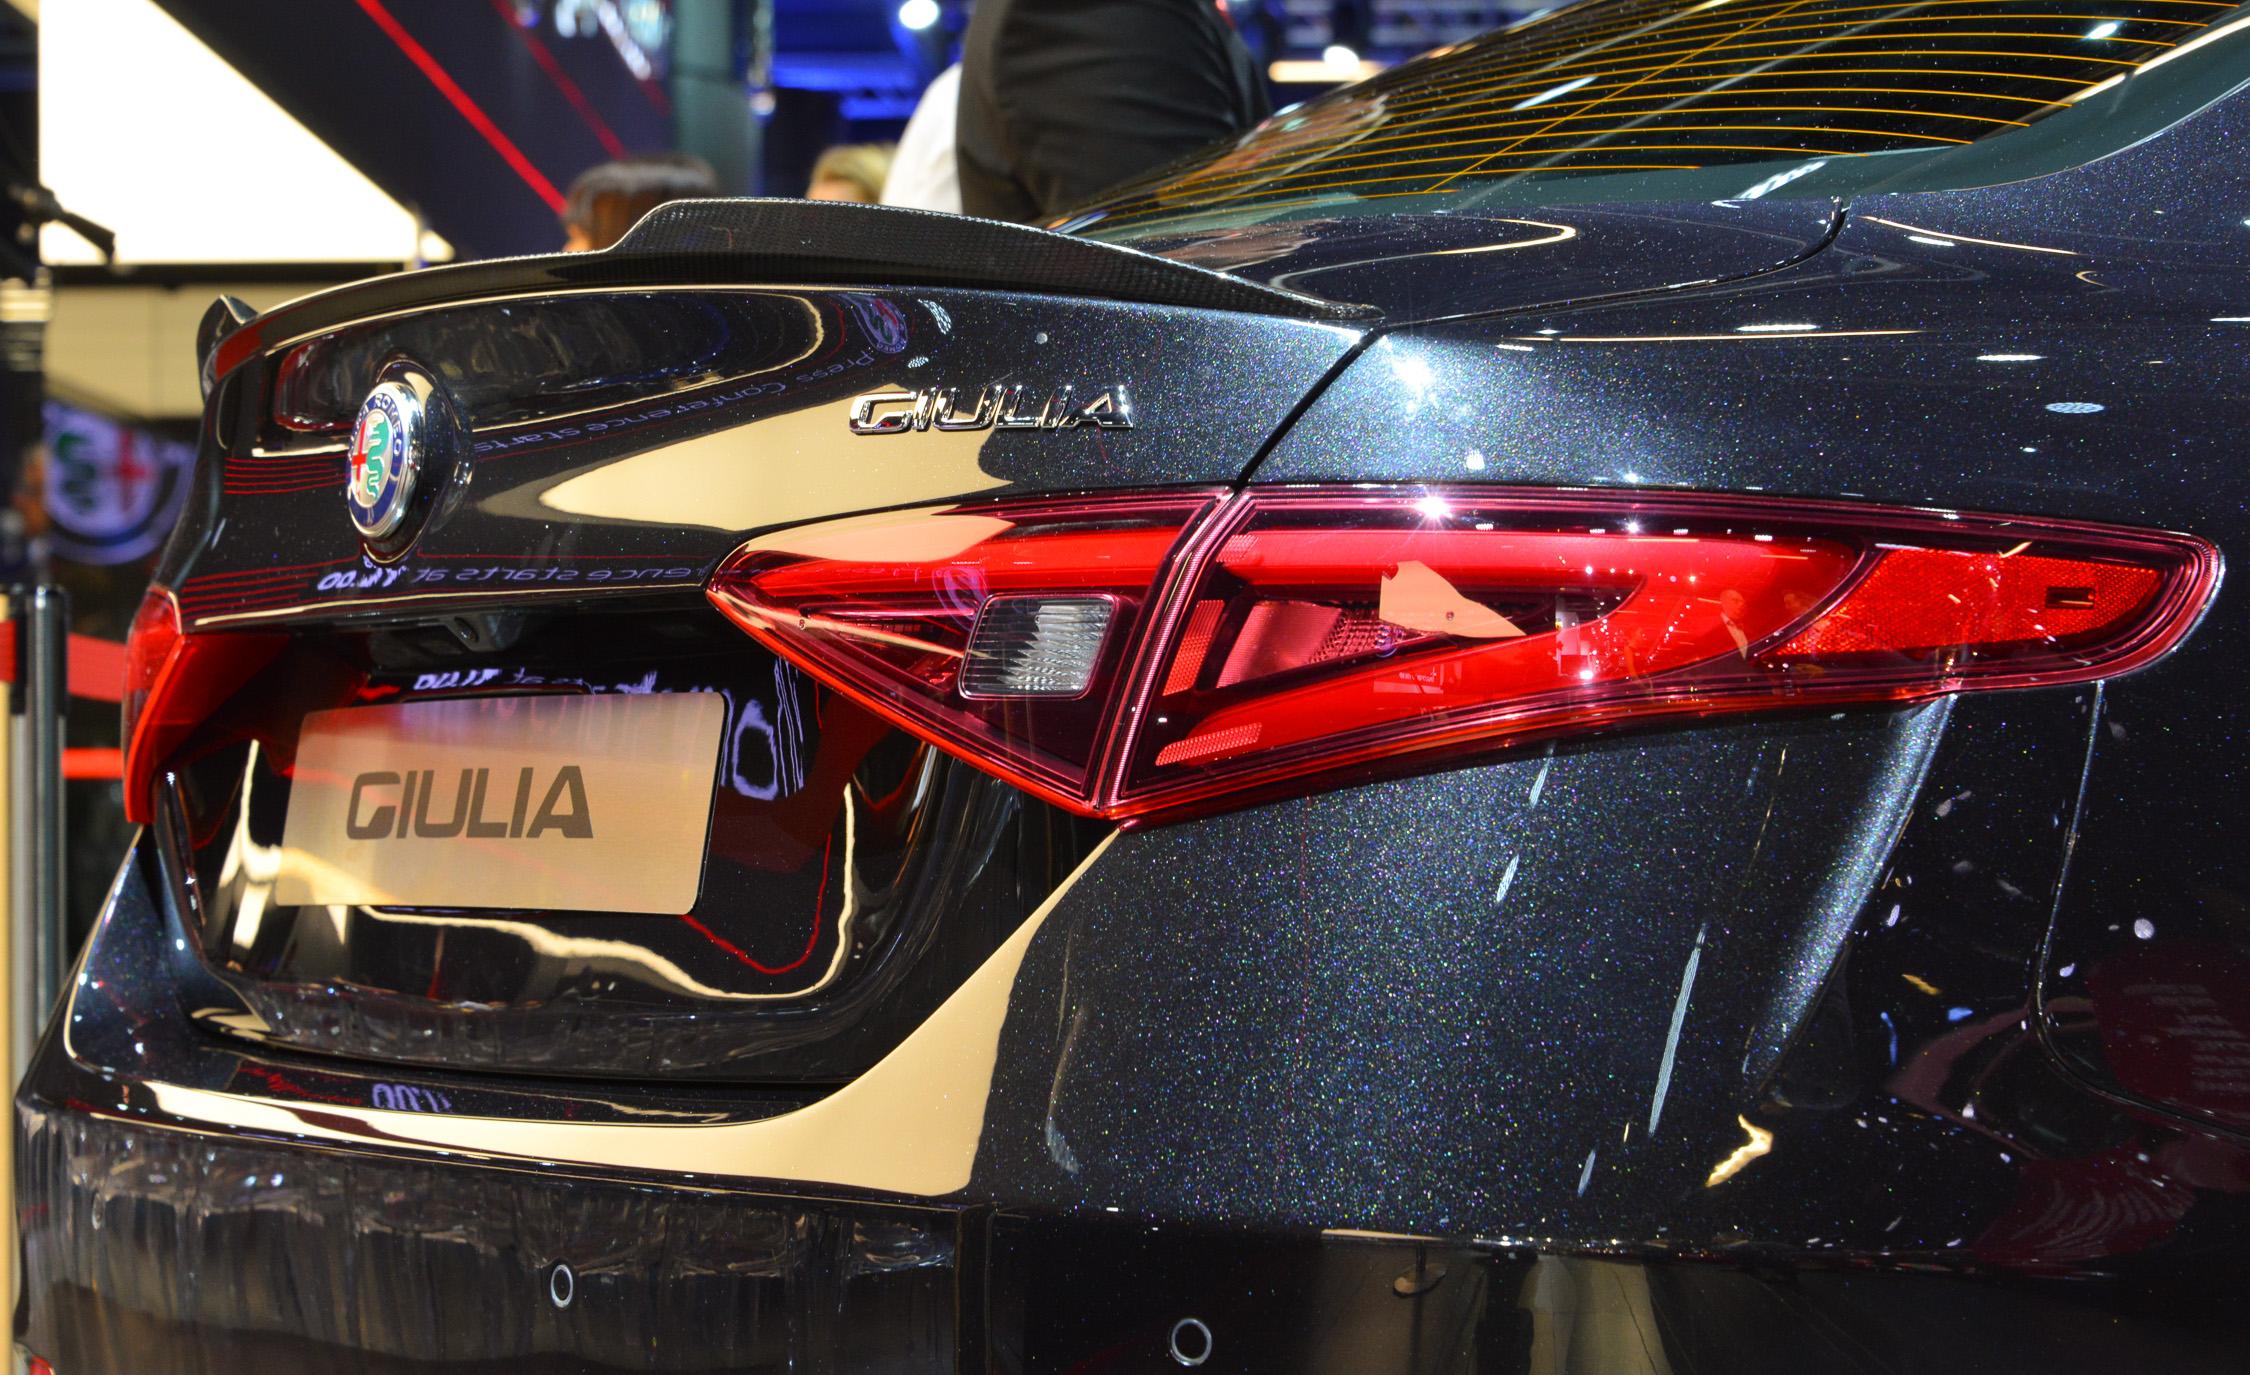 Taillight Design of 2017 Alfa Romeo Giulia Quadrifoglio